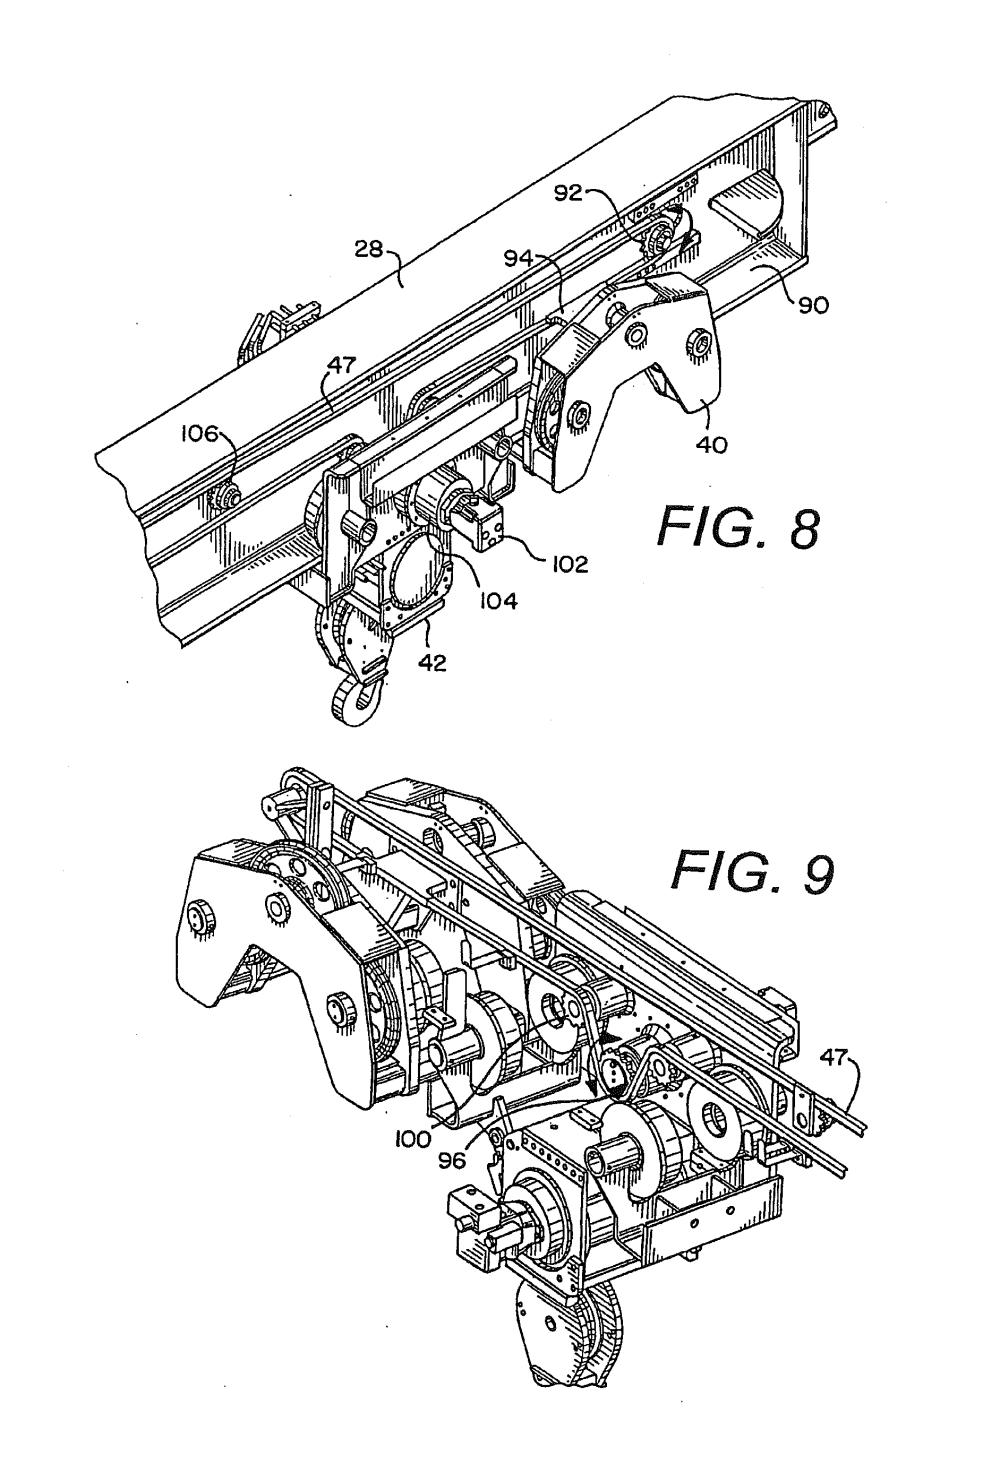 medium resolution of 1983 chevy 454 engine belt diagram wiring library 1994 chevy 454 belt diagram 1985 chevy 454